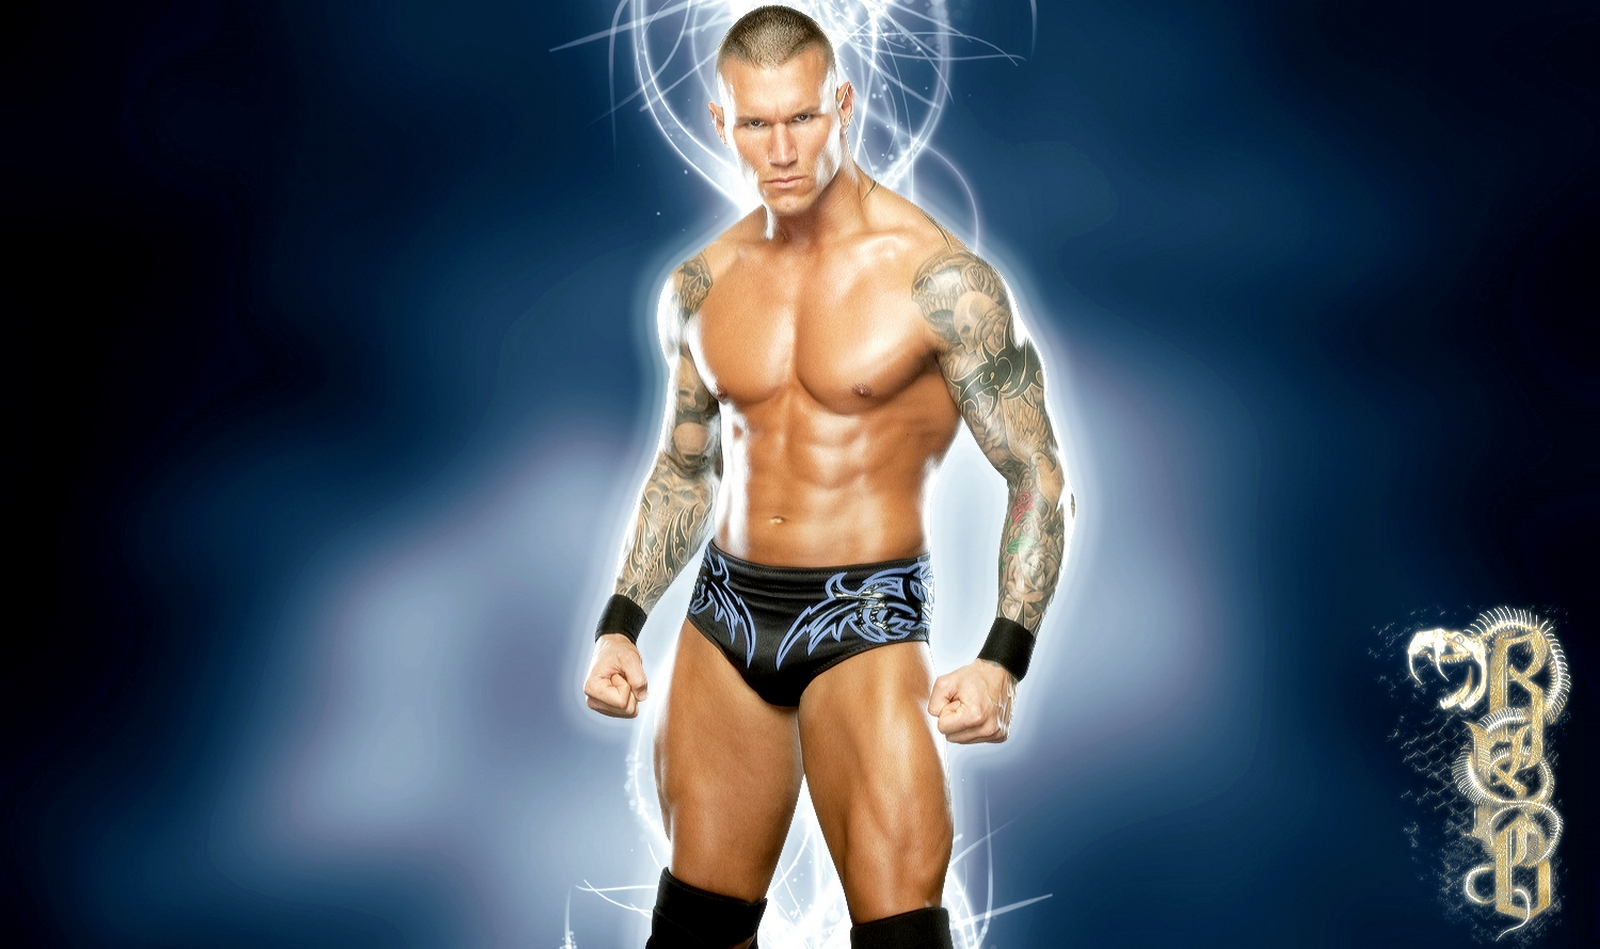 Randy Orton HD Wallpapers